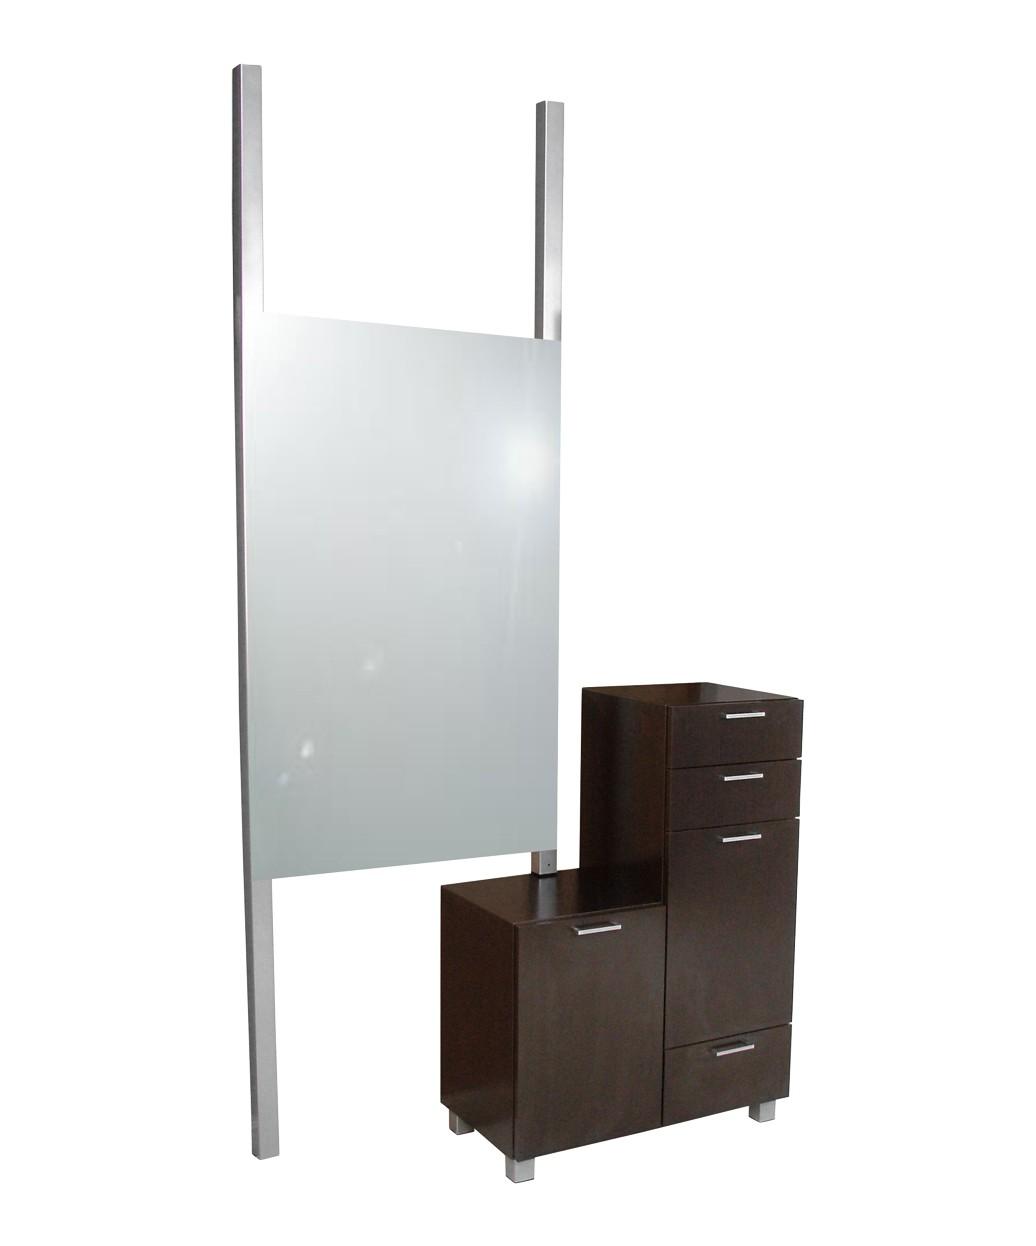 Collins 937 Amati Bi-Level Styling Vanity